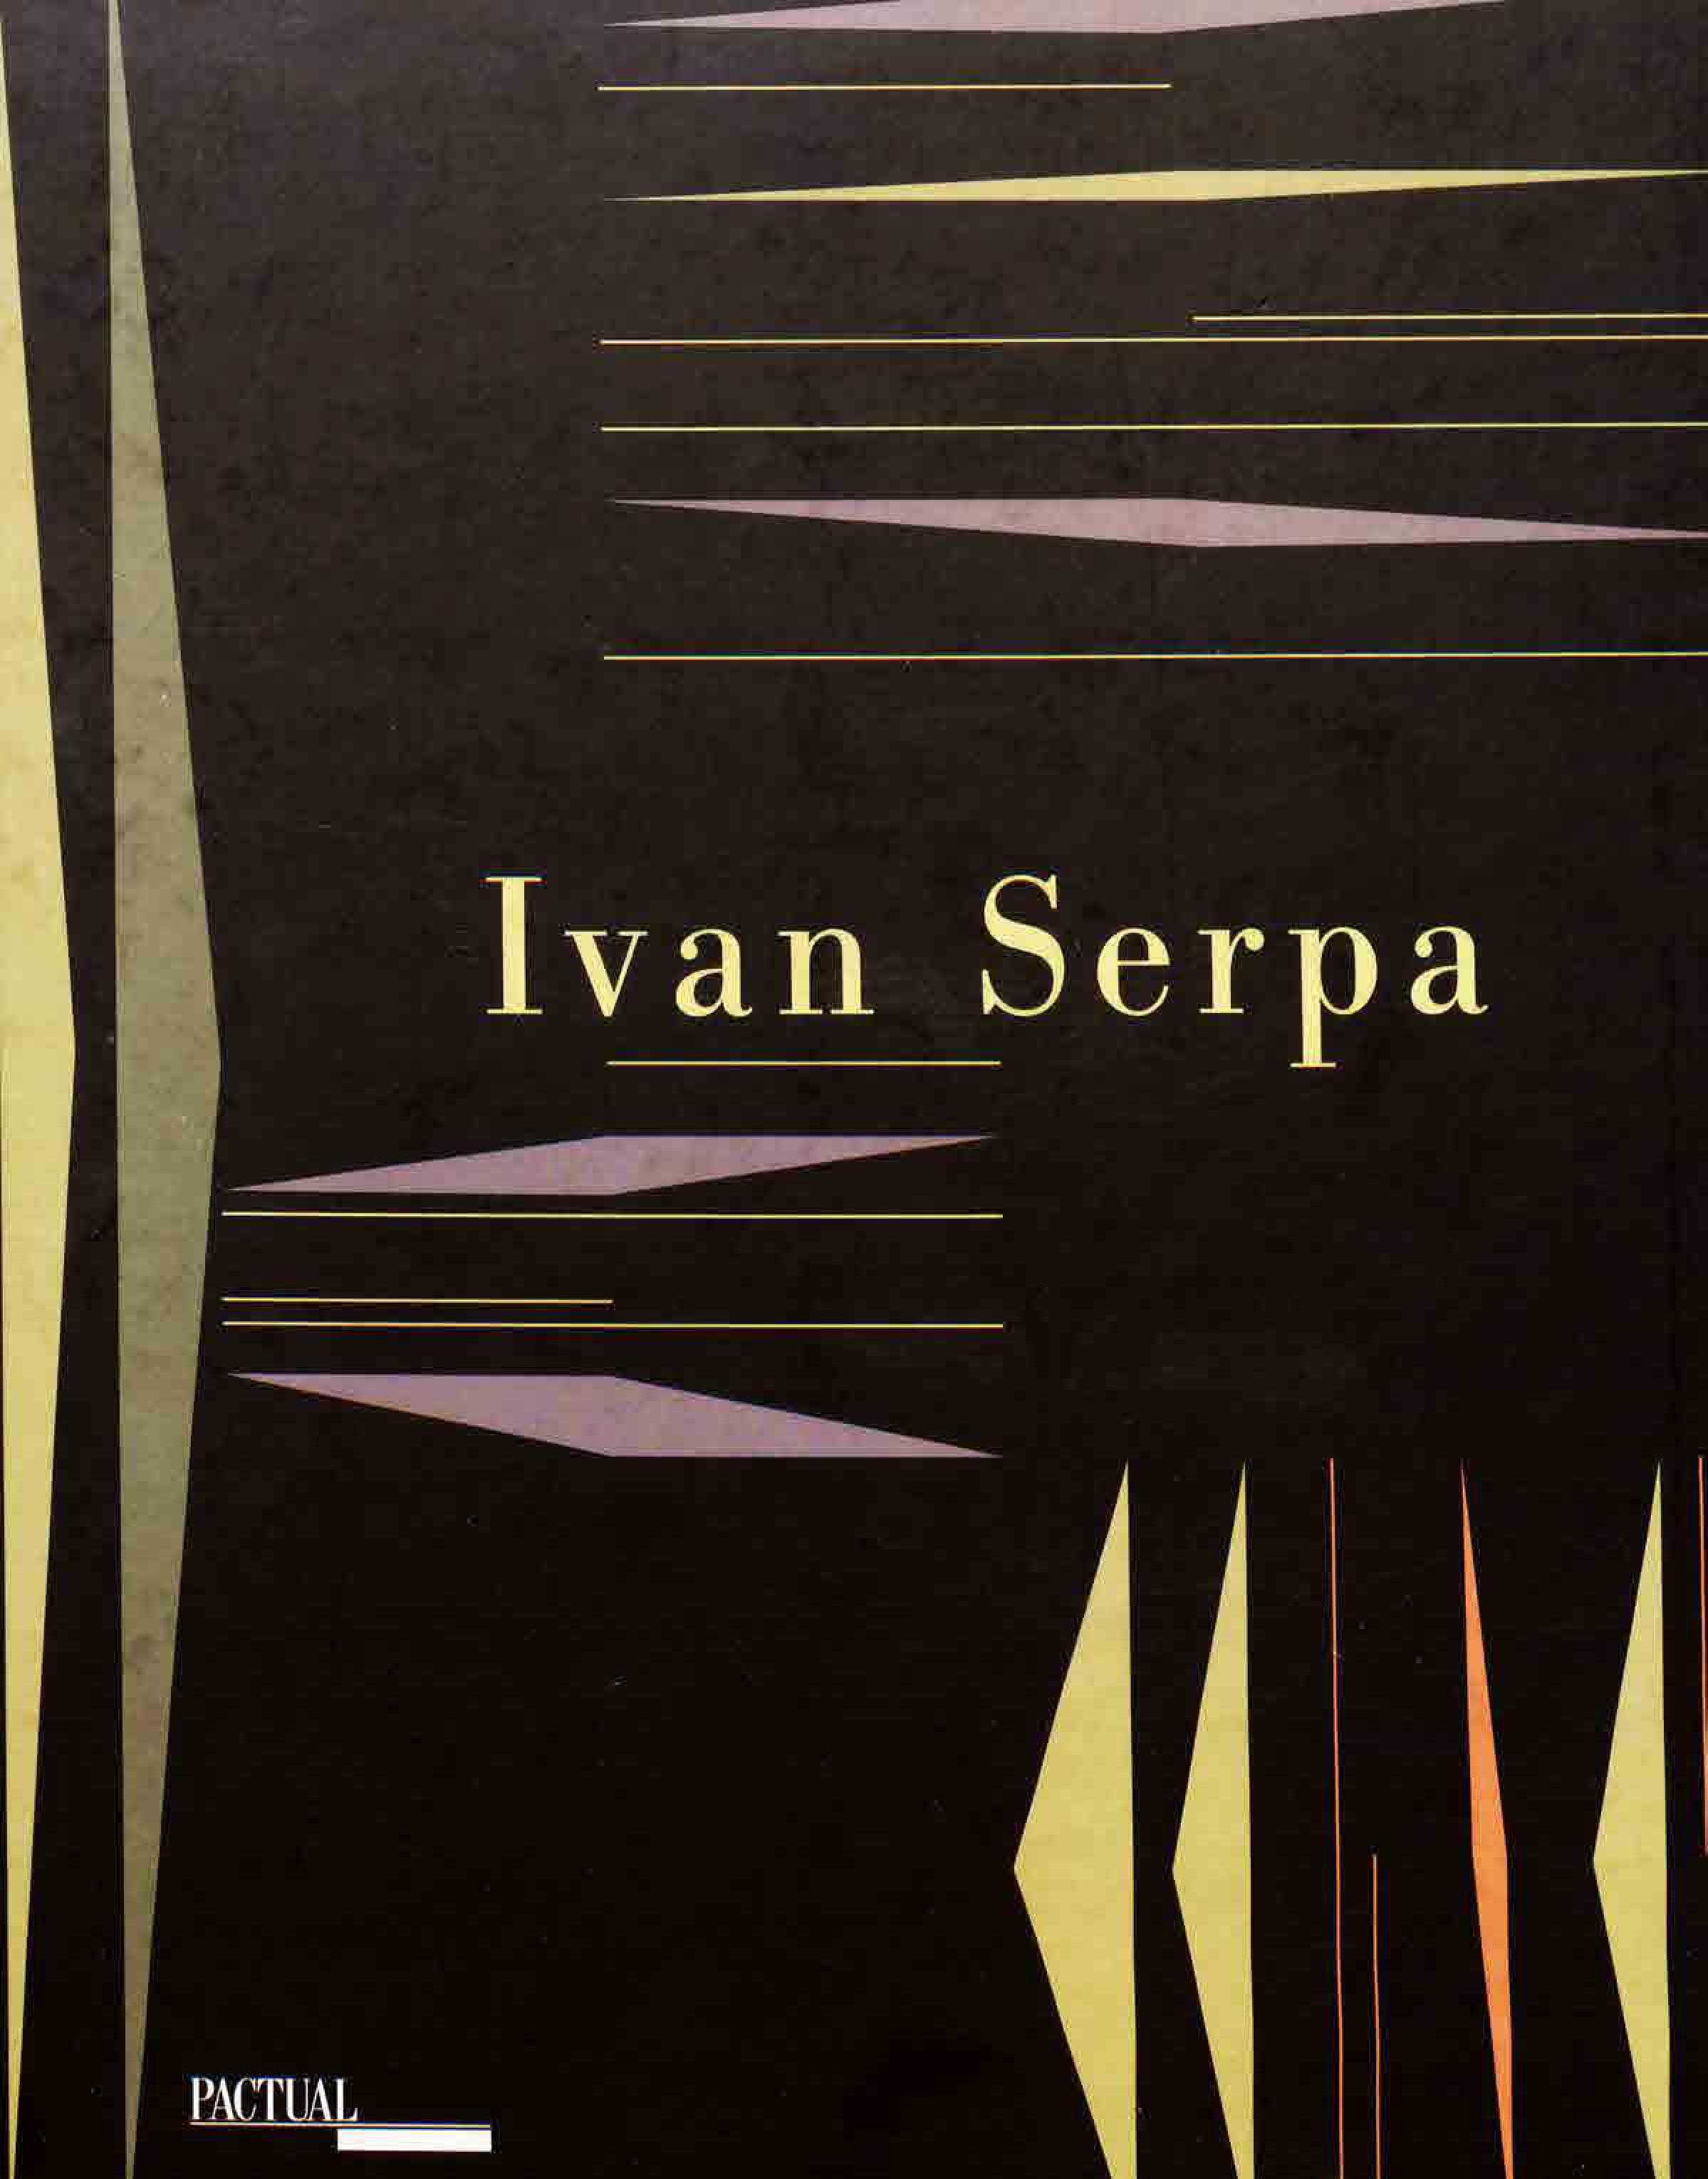 Capa do livro Ivan Serpa